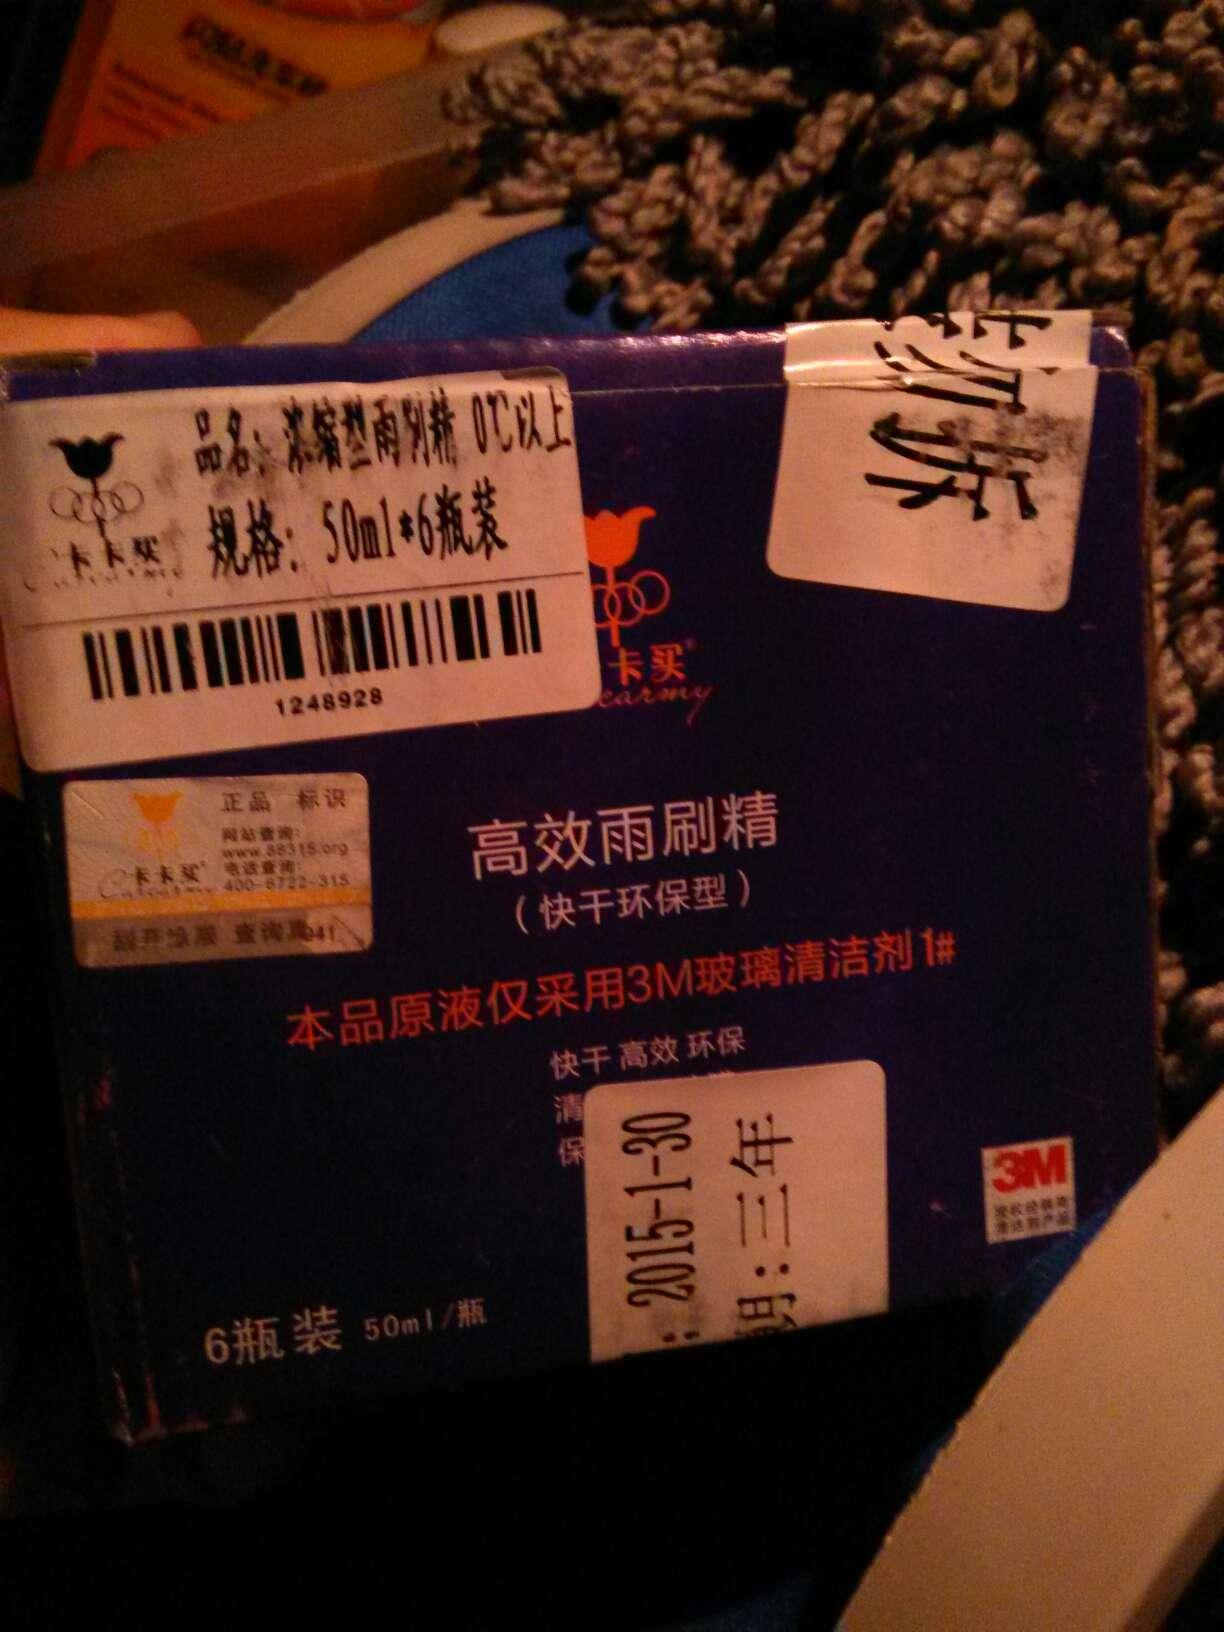 jordan 6 rings black/white/gym red/anthracite price 00946166 cheapestonline